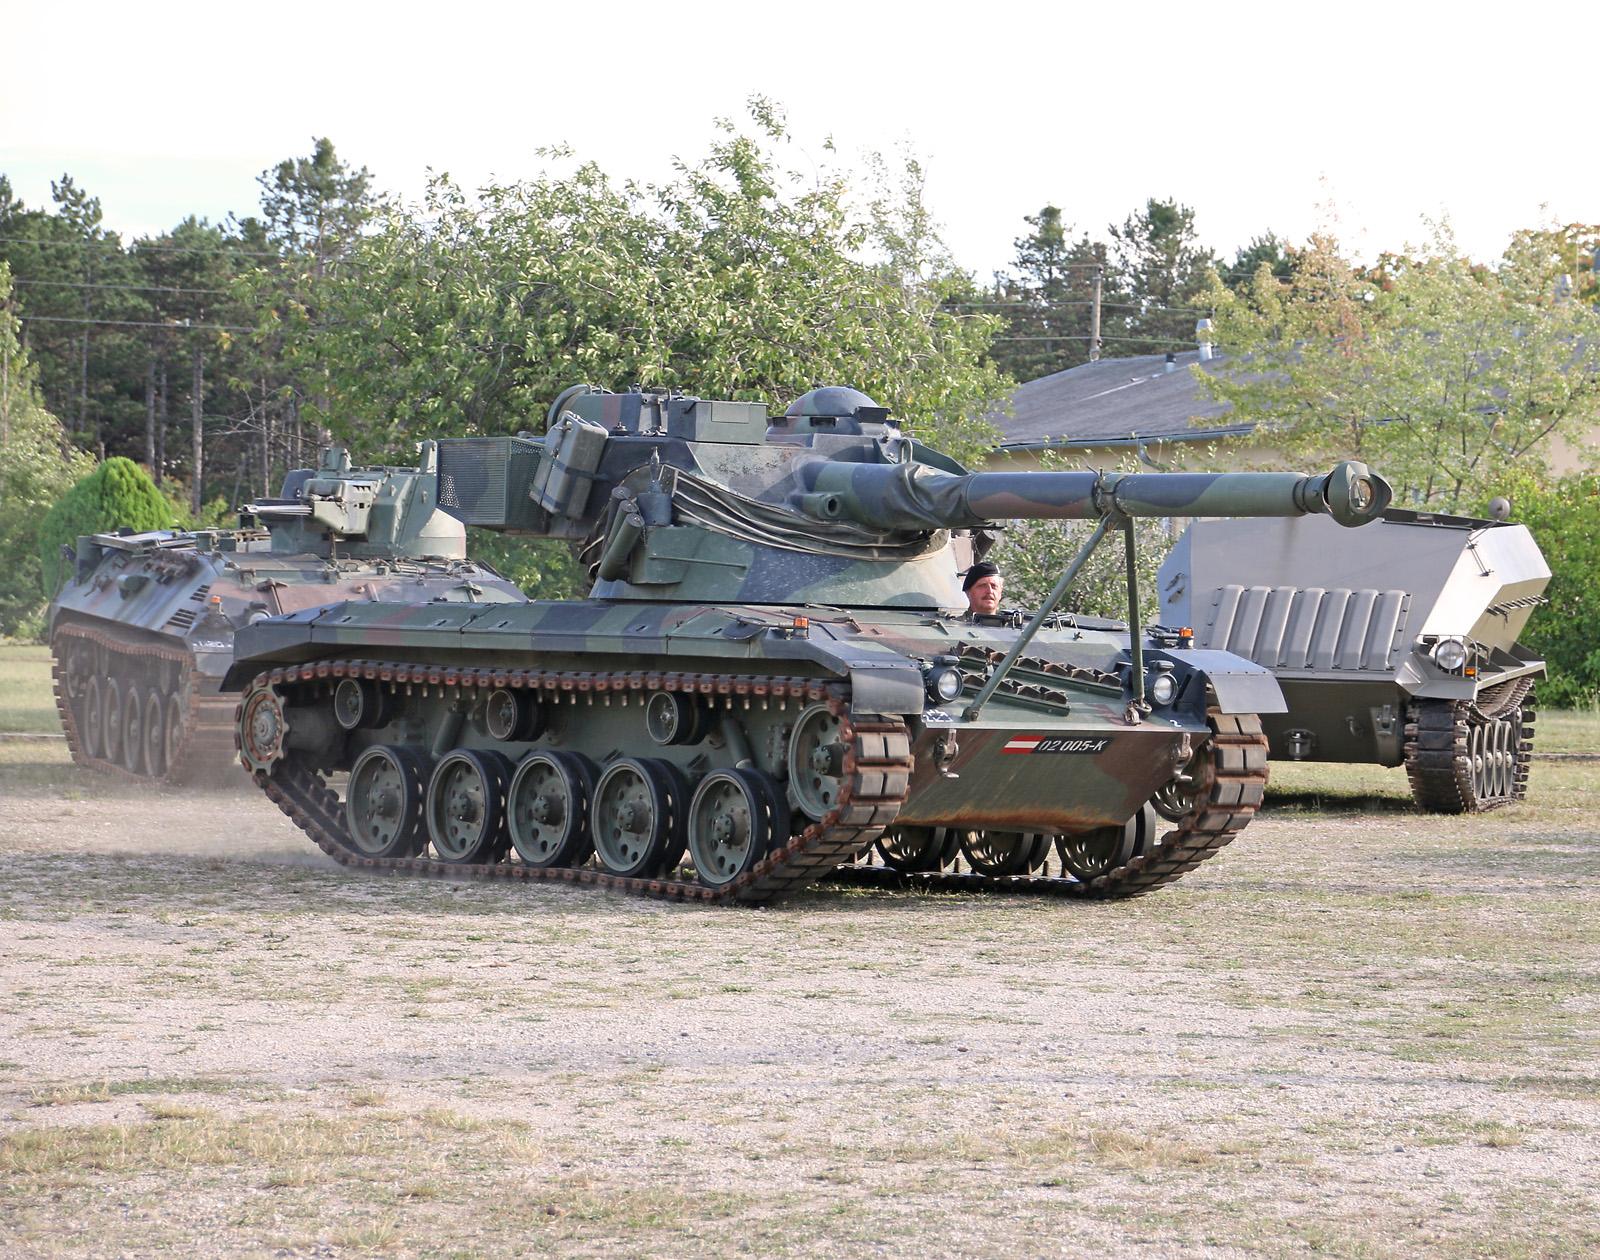 Jagdpanzer SK-105 Kürassier A2 © Doppeladler.com